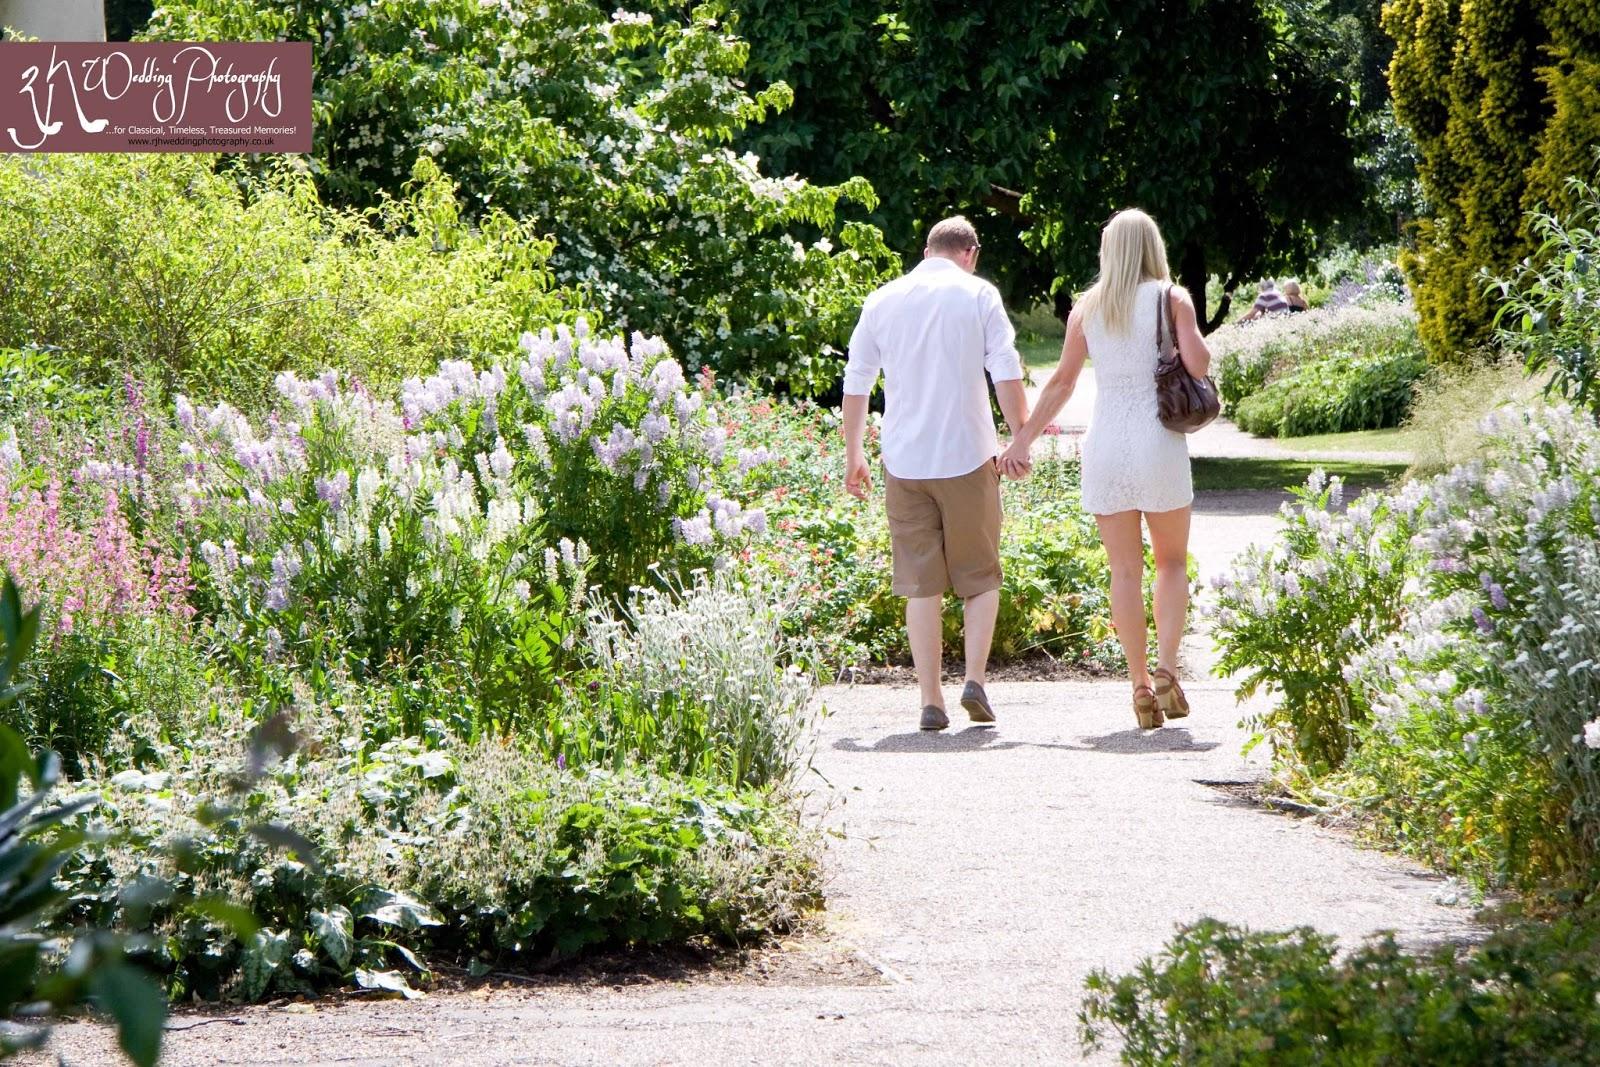 Sheffield Wedding Photography Sheffield Botanical Gardens  Www.rjhweddingphotography.co.uk